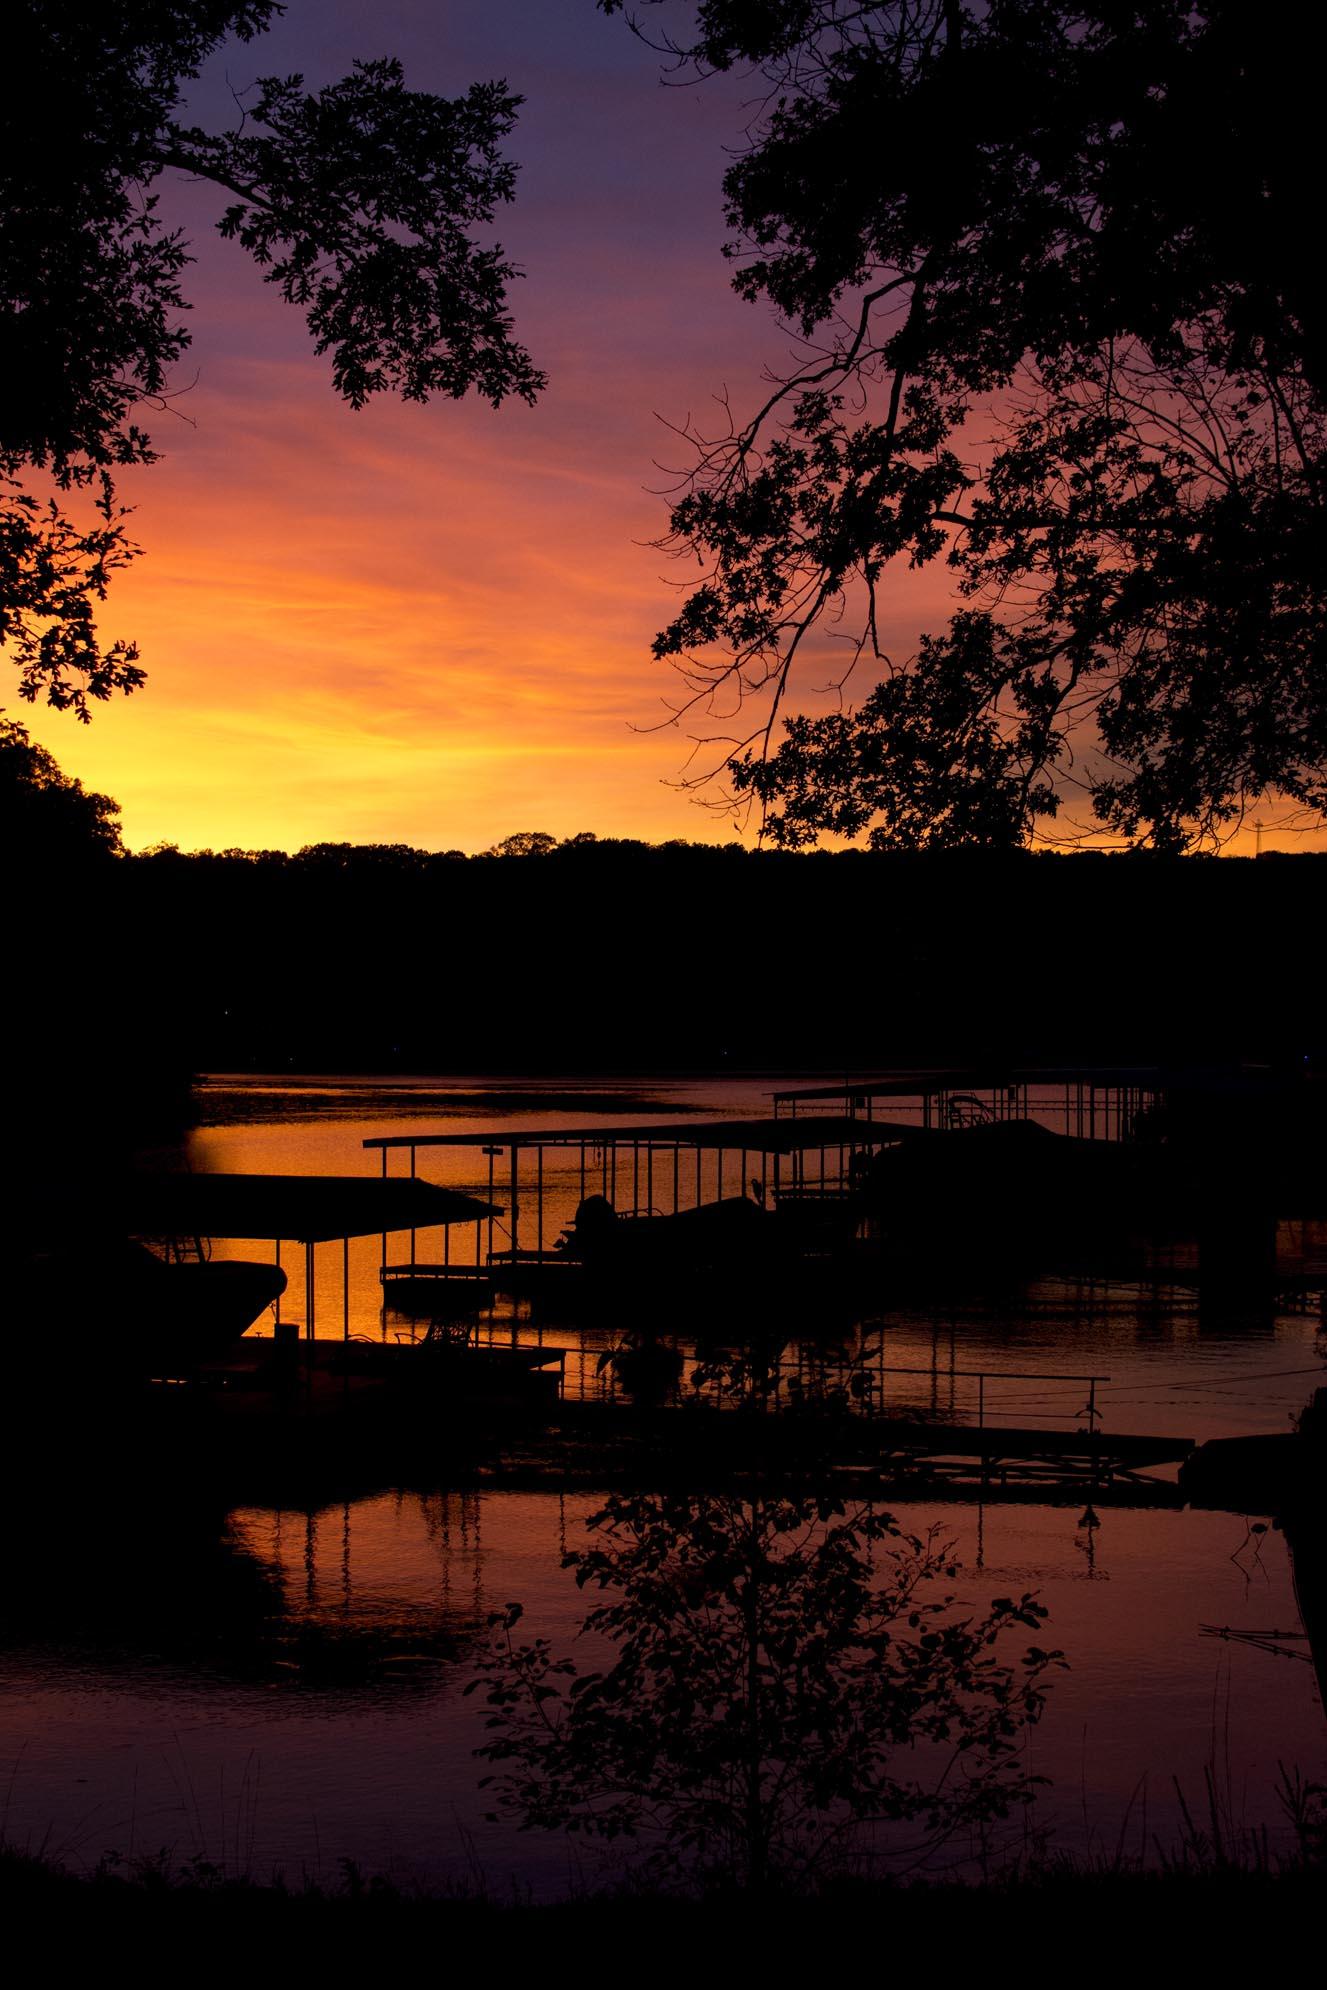 sunset3_lakehouse_10-10-15.jpg